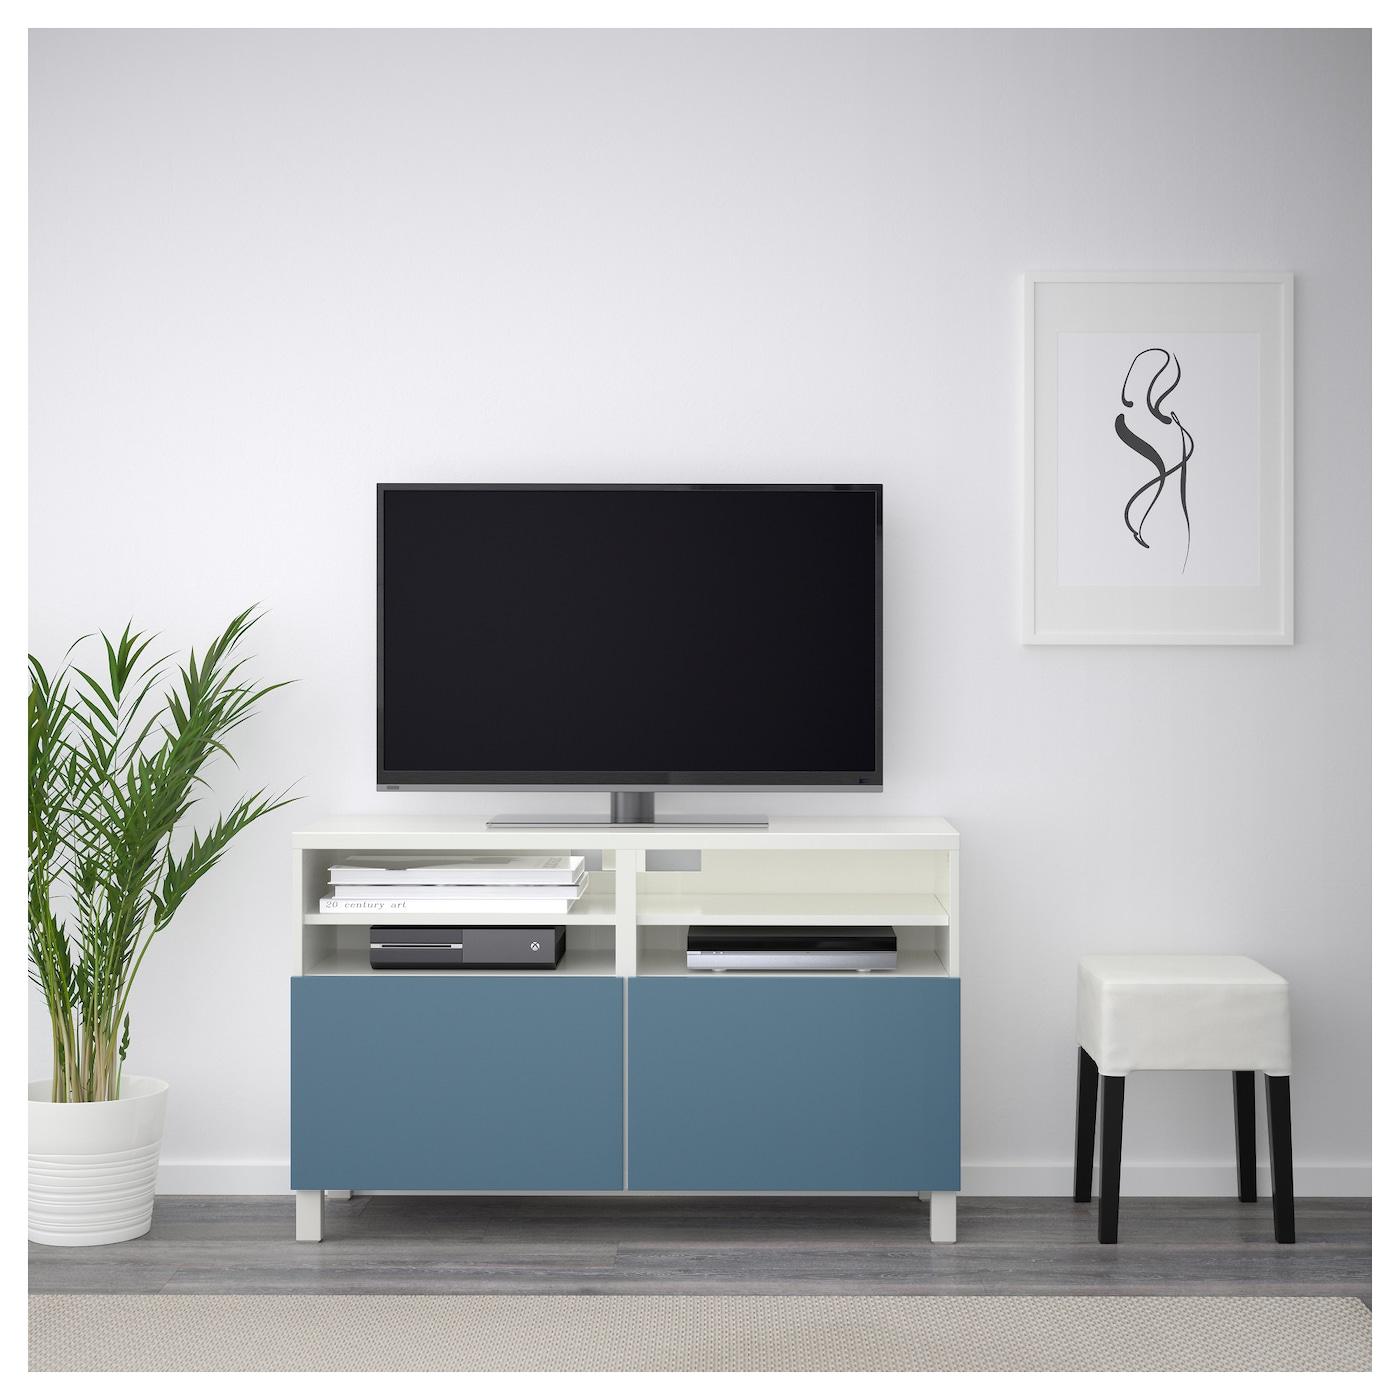 Best Banc Tv Avec Portes Blanc Valviken Bleu Fonc 120x40x74 Cm  # Meuble Tv Hetre Massif